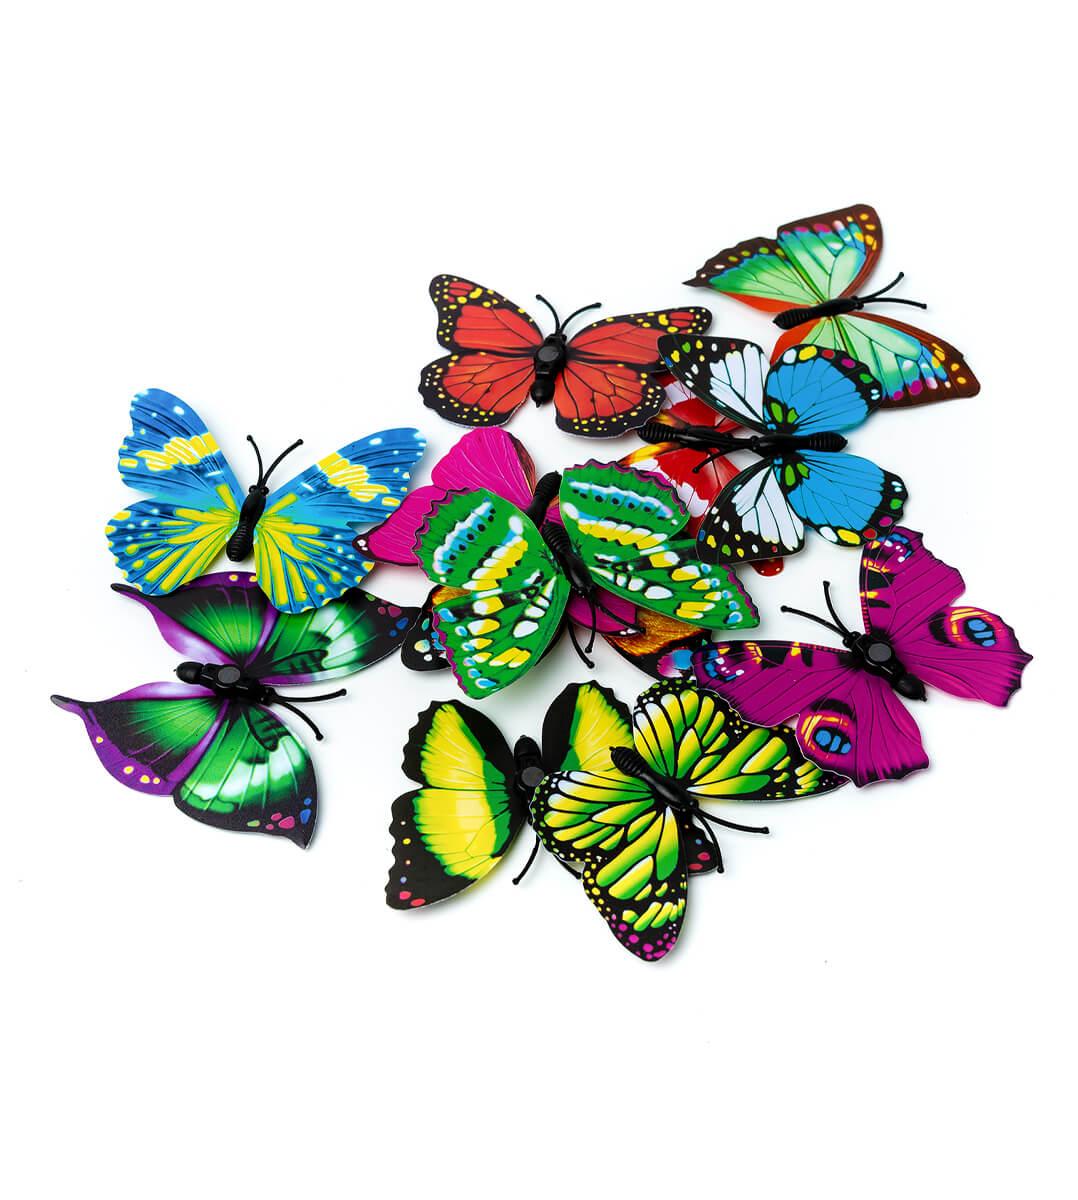 Декор Бабочки на магните 12шт с